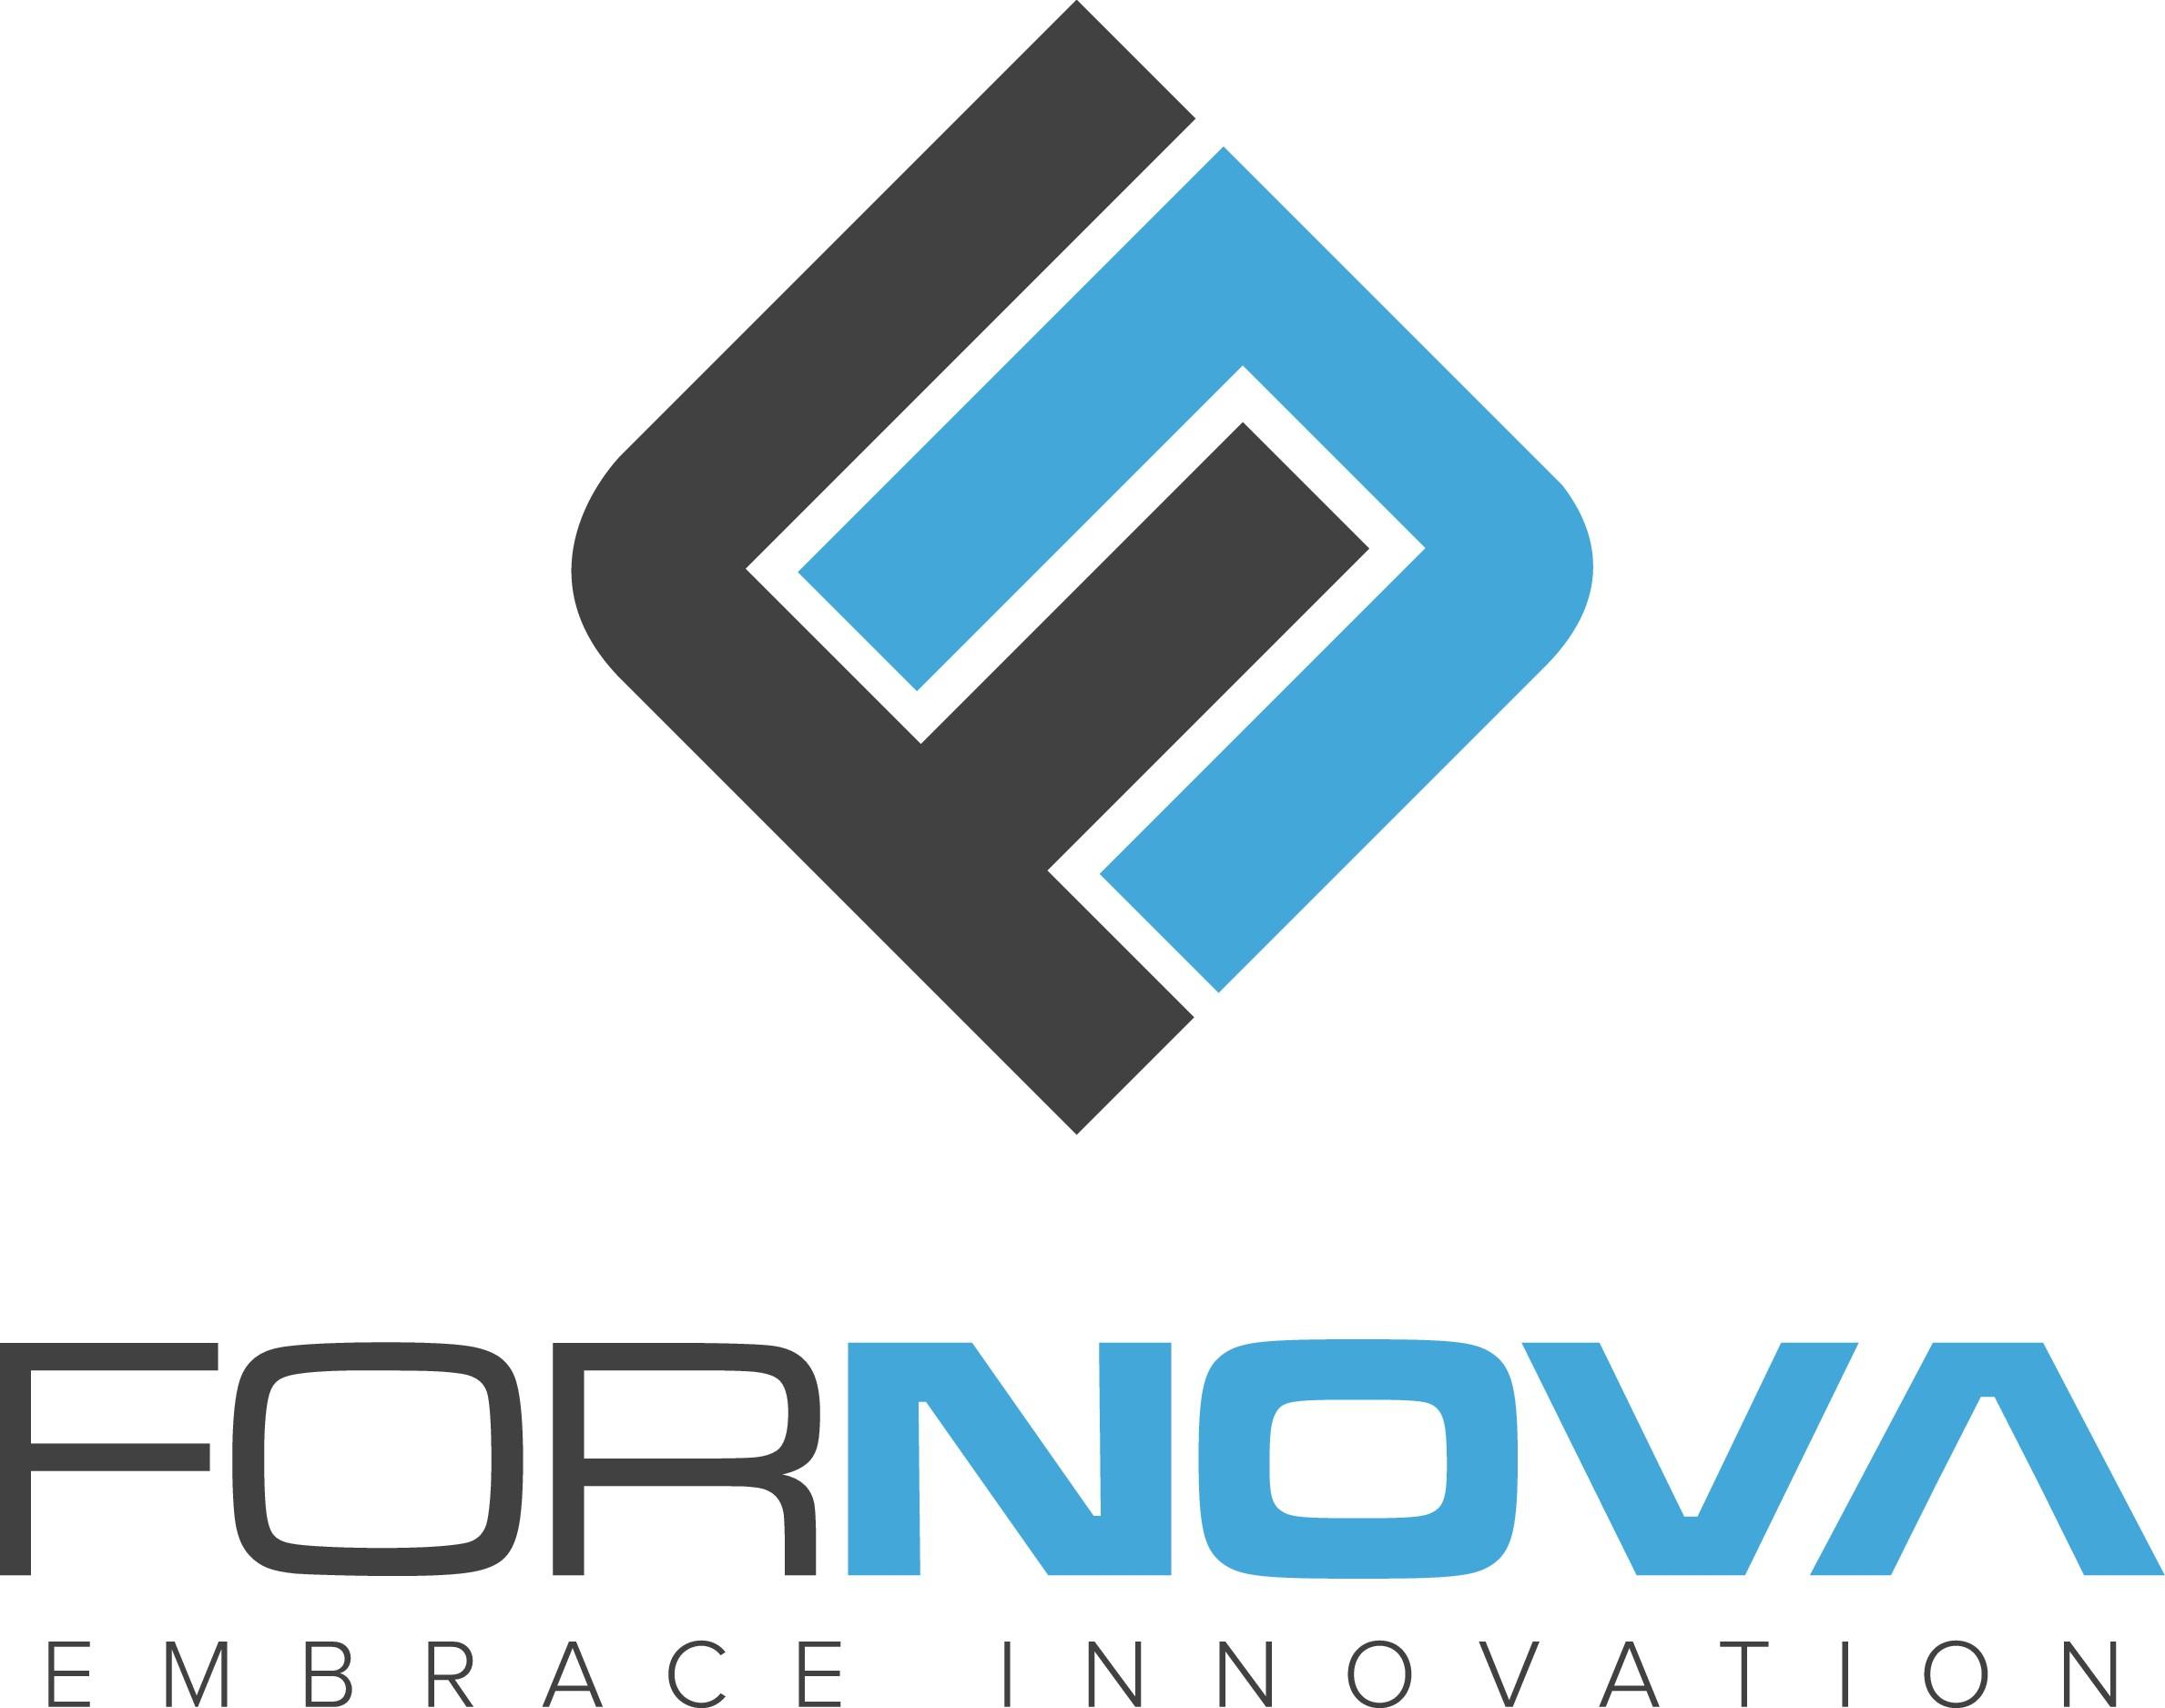 Edit of logo design